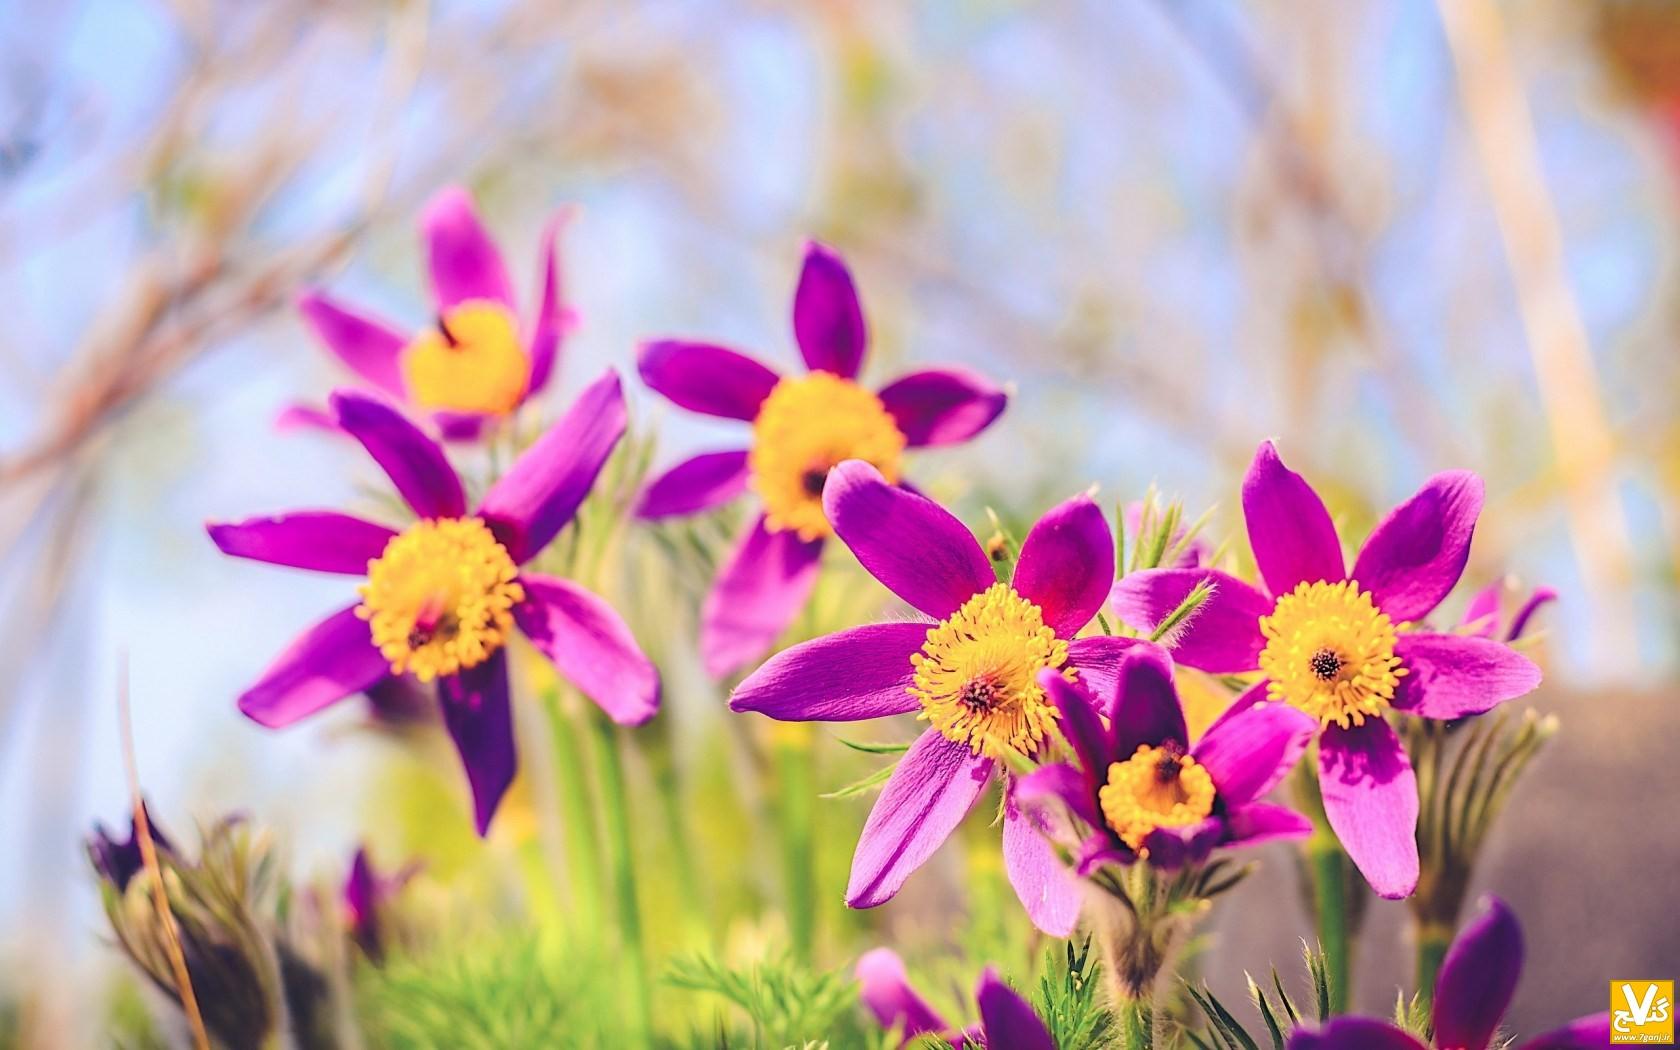 spring-flowers-nature-bokeh-wallpaper-1680x1050